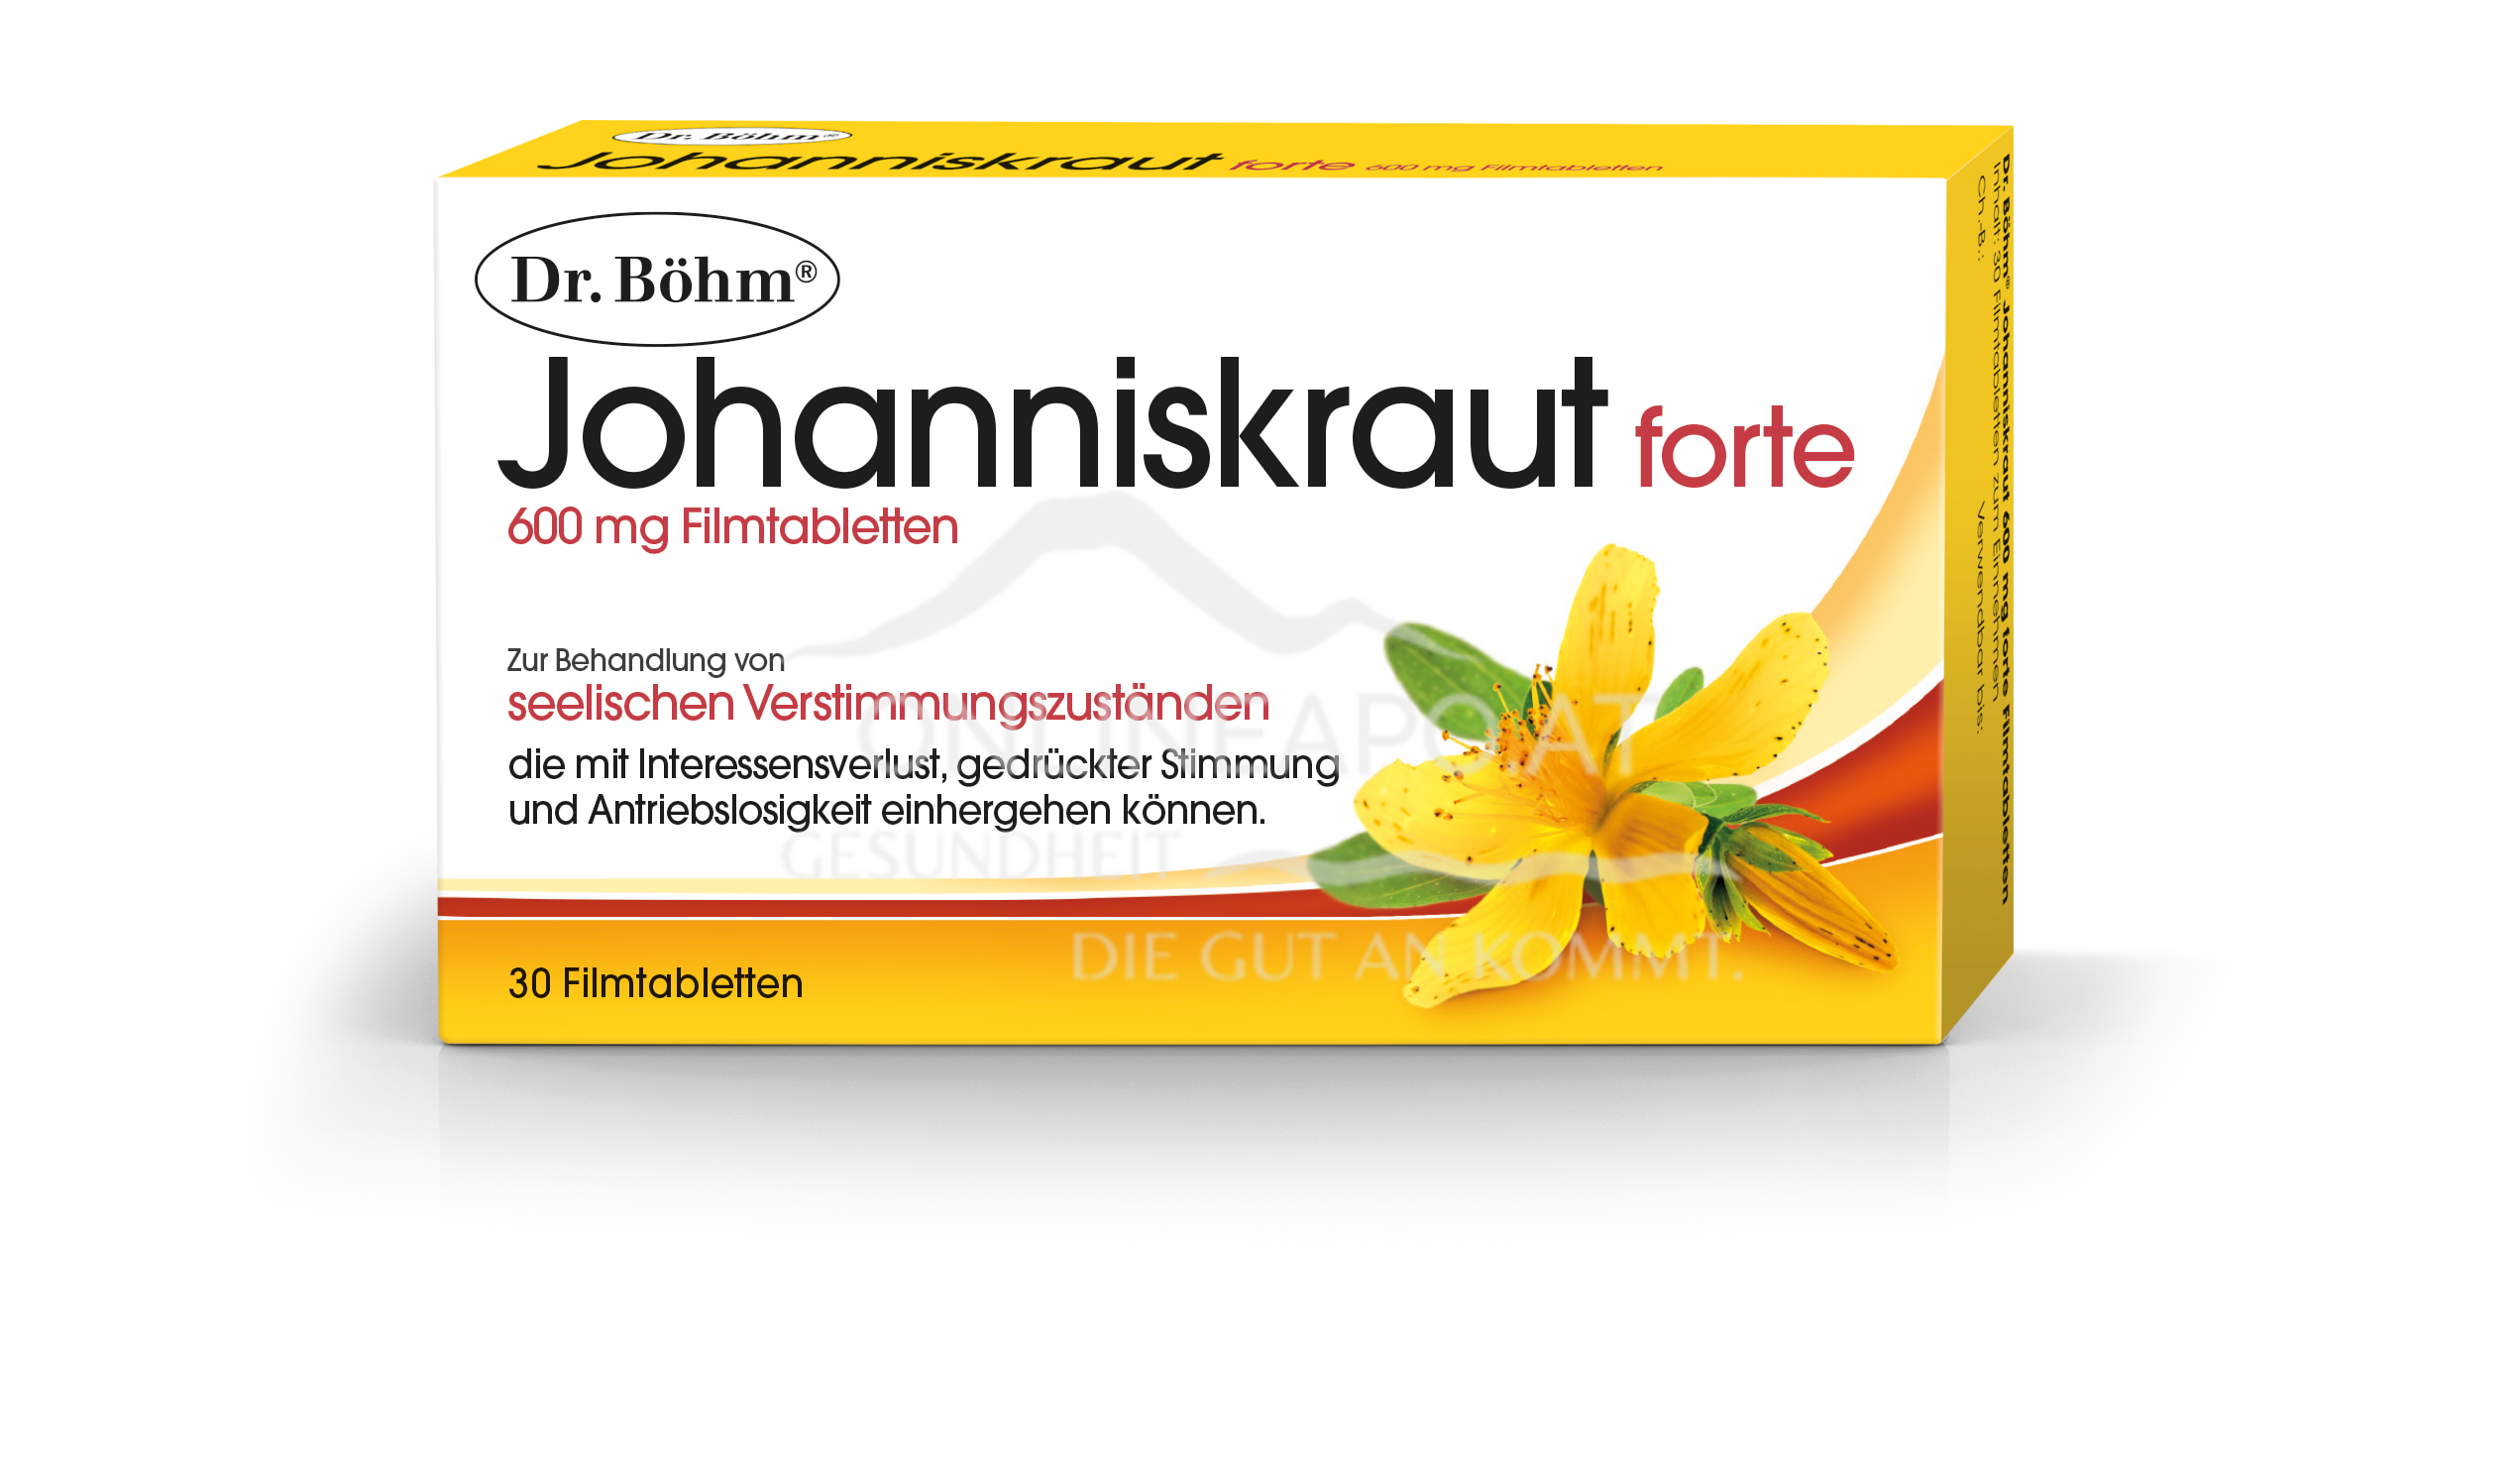 Dr. Böhm® Johanniskraut 600 mg forte